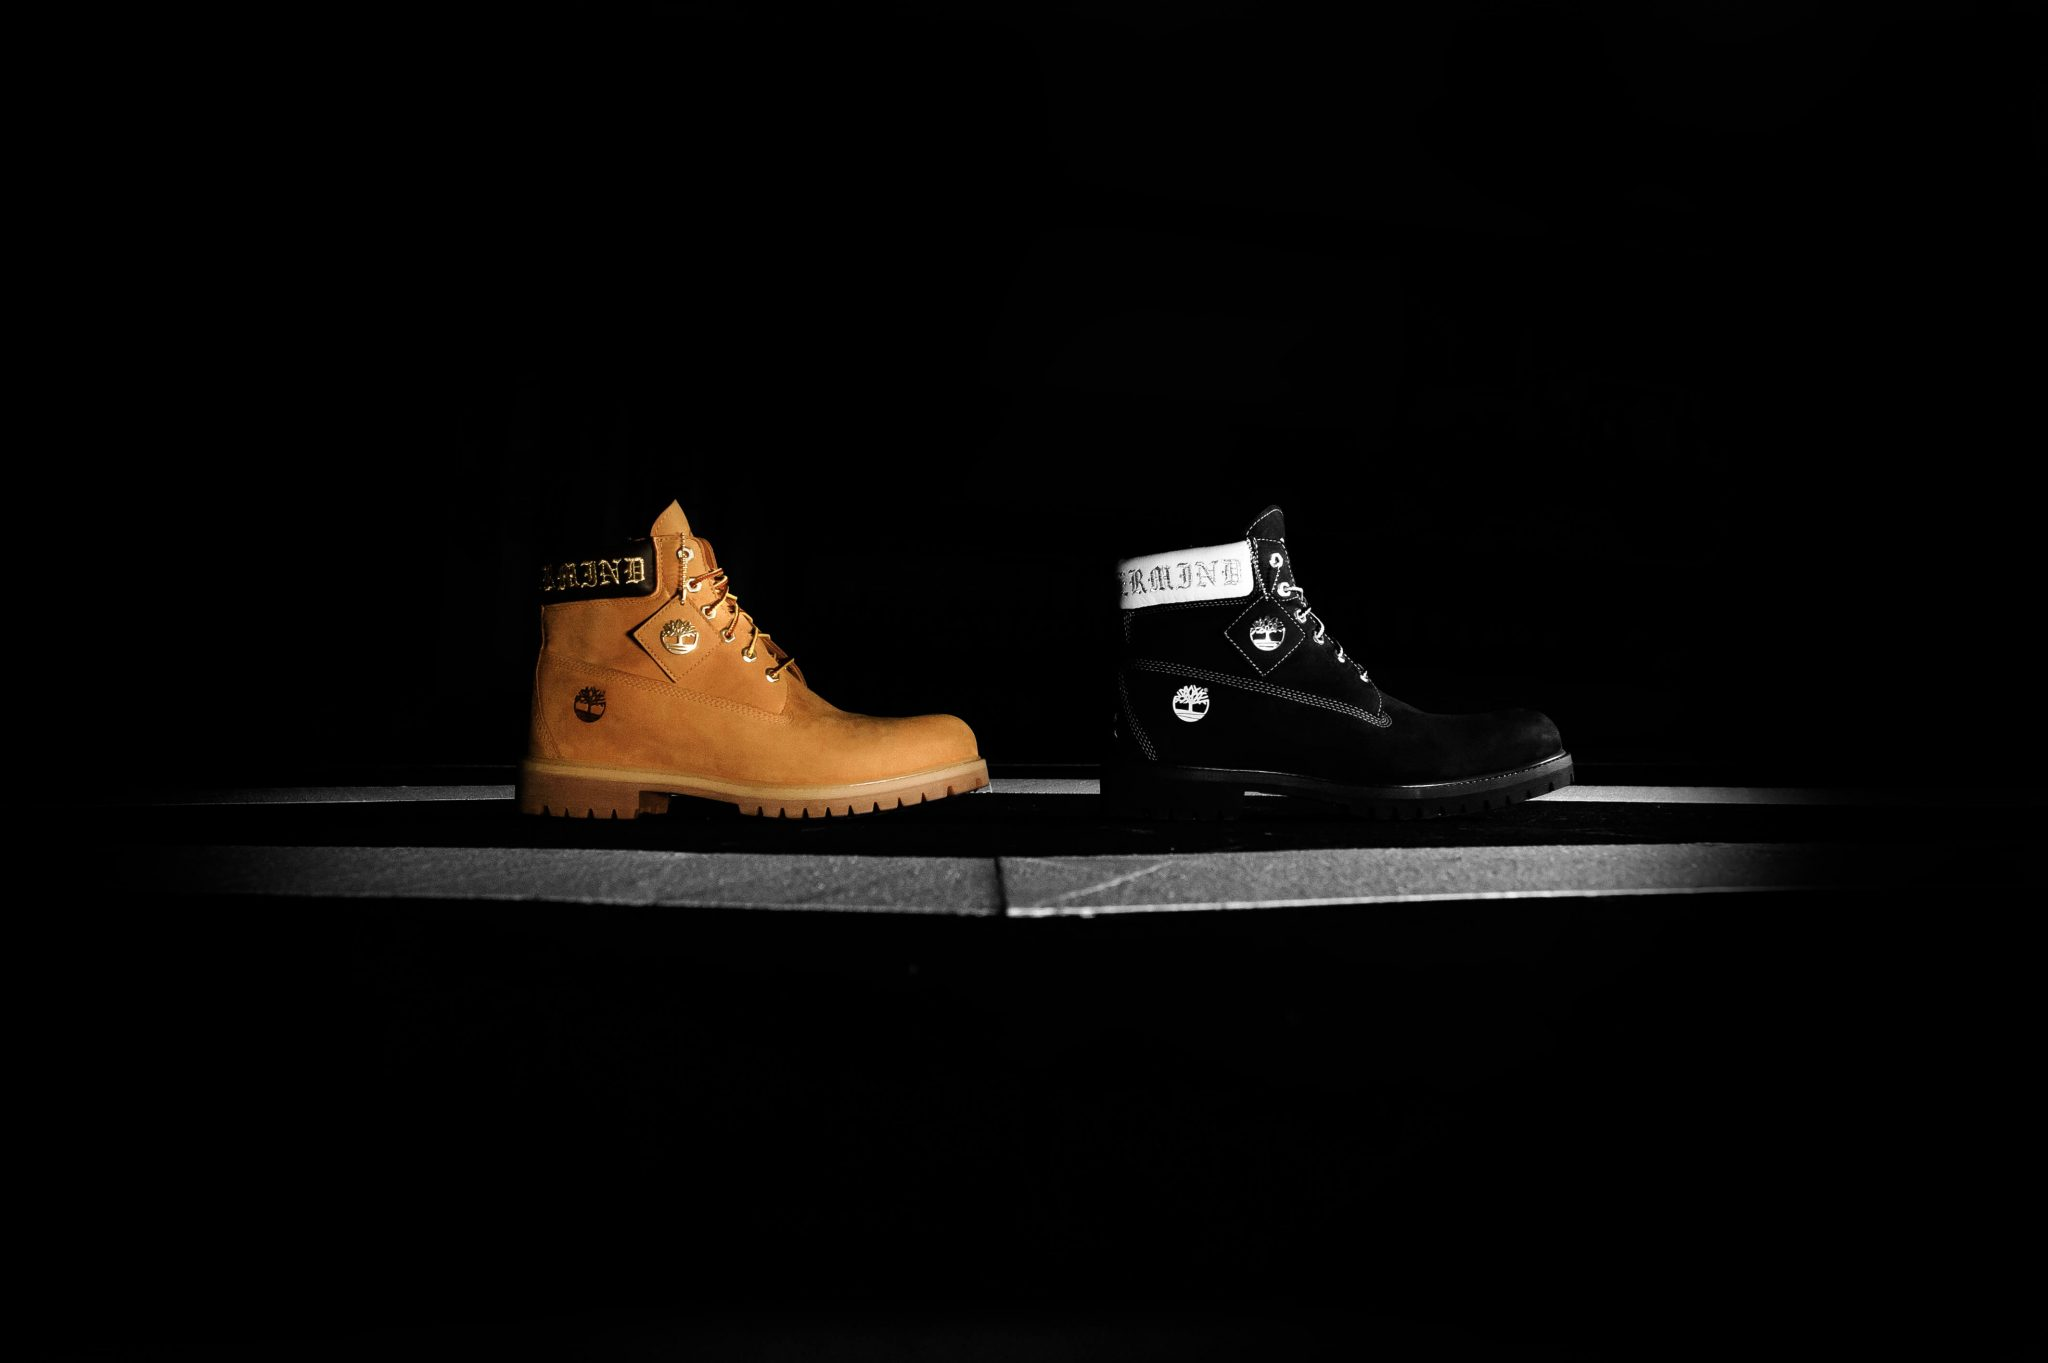 28b2c440e9839 6 Sneaker Collaborations on Our Radar This September - Men's Folio